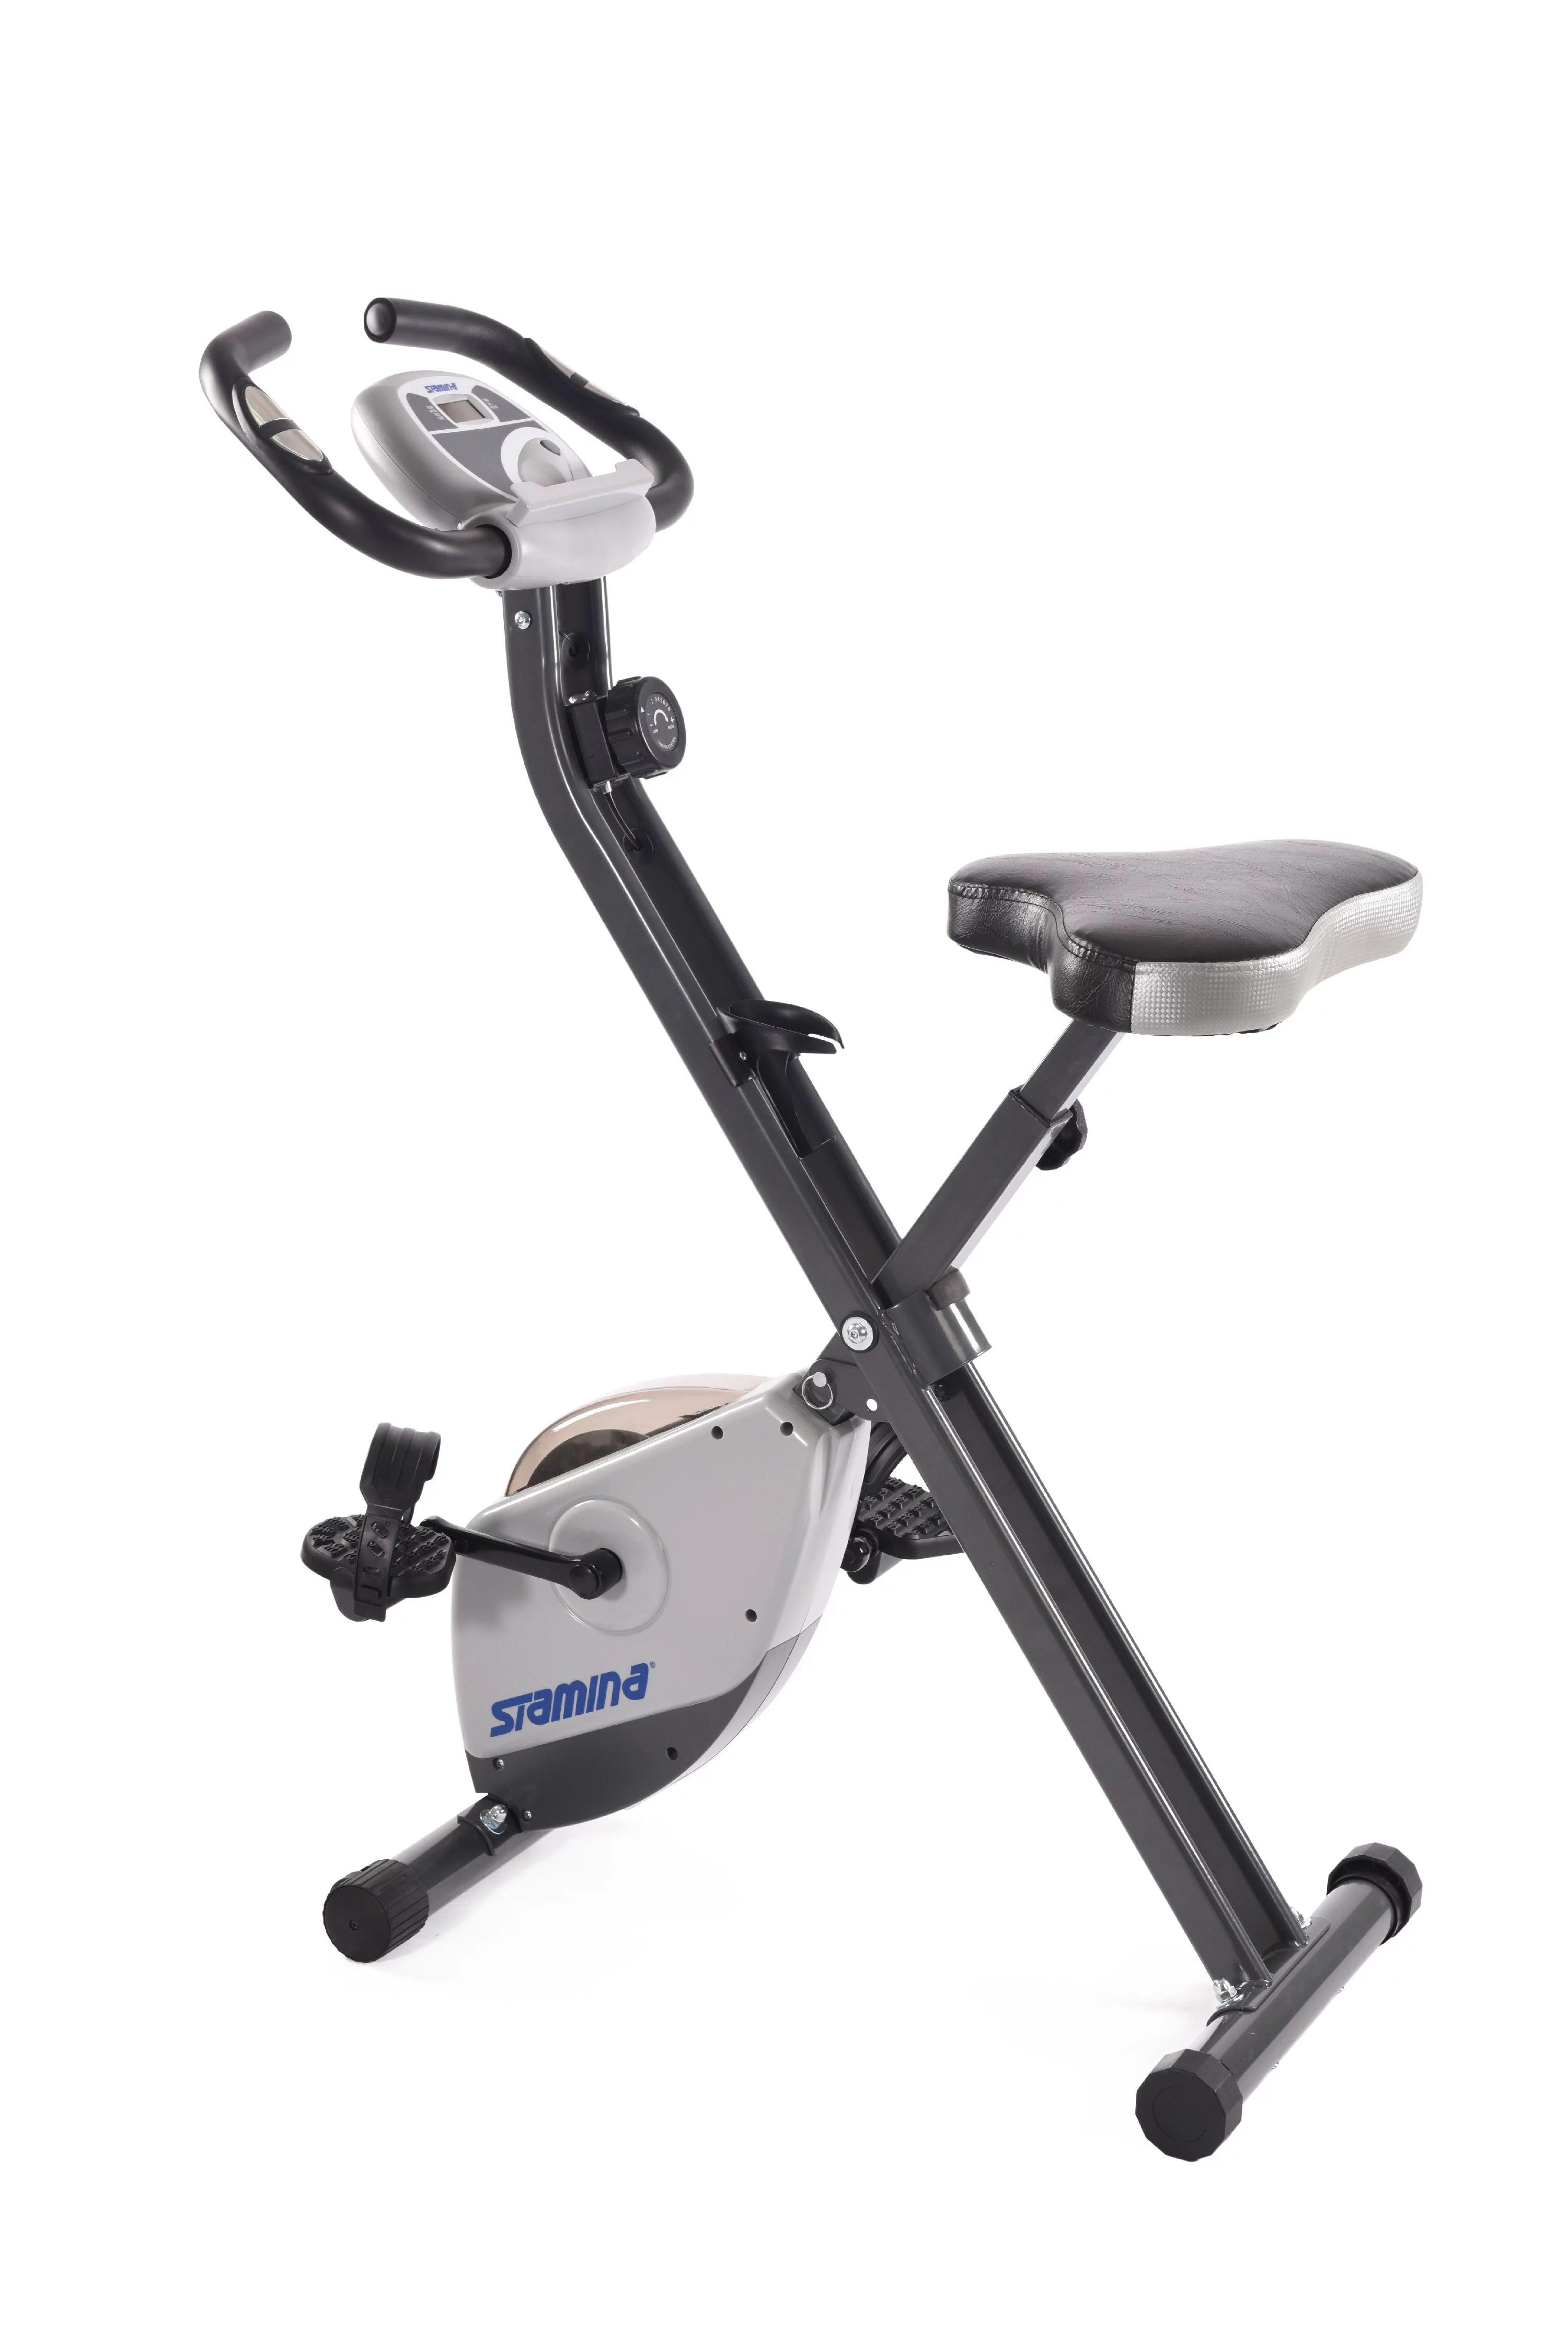 Stamina Cardio Folding Exercise Bike with Heart Rate ...